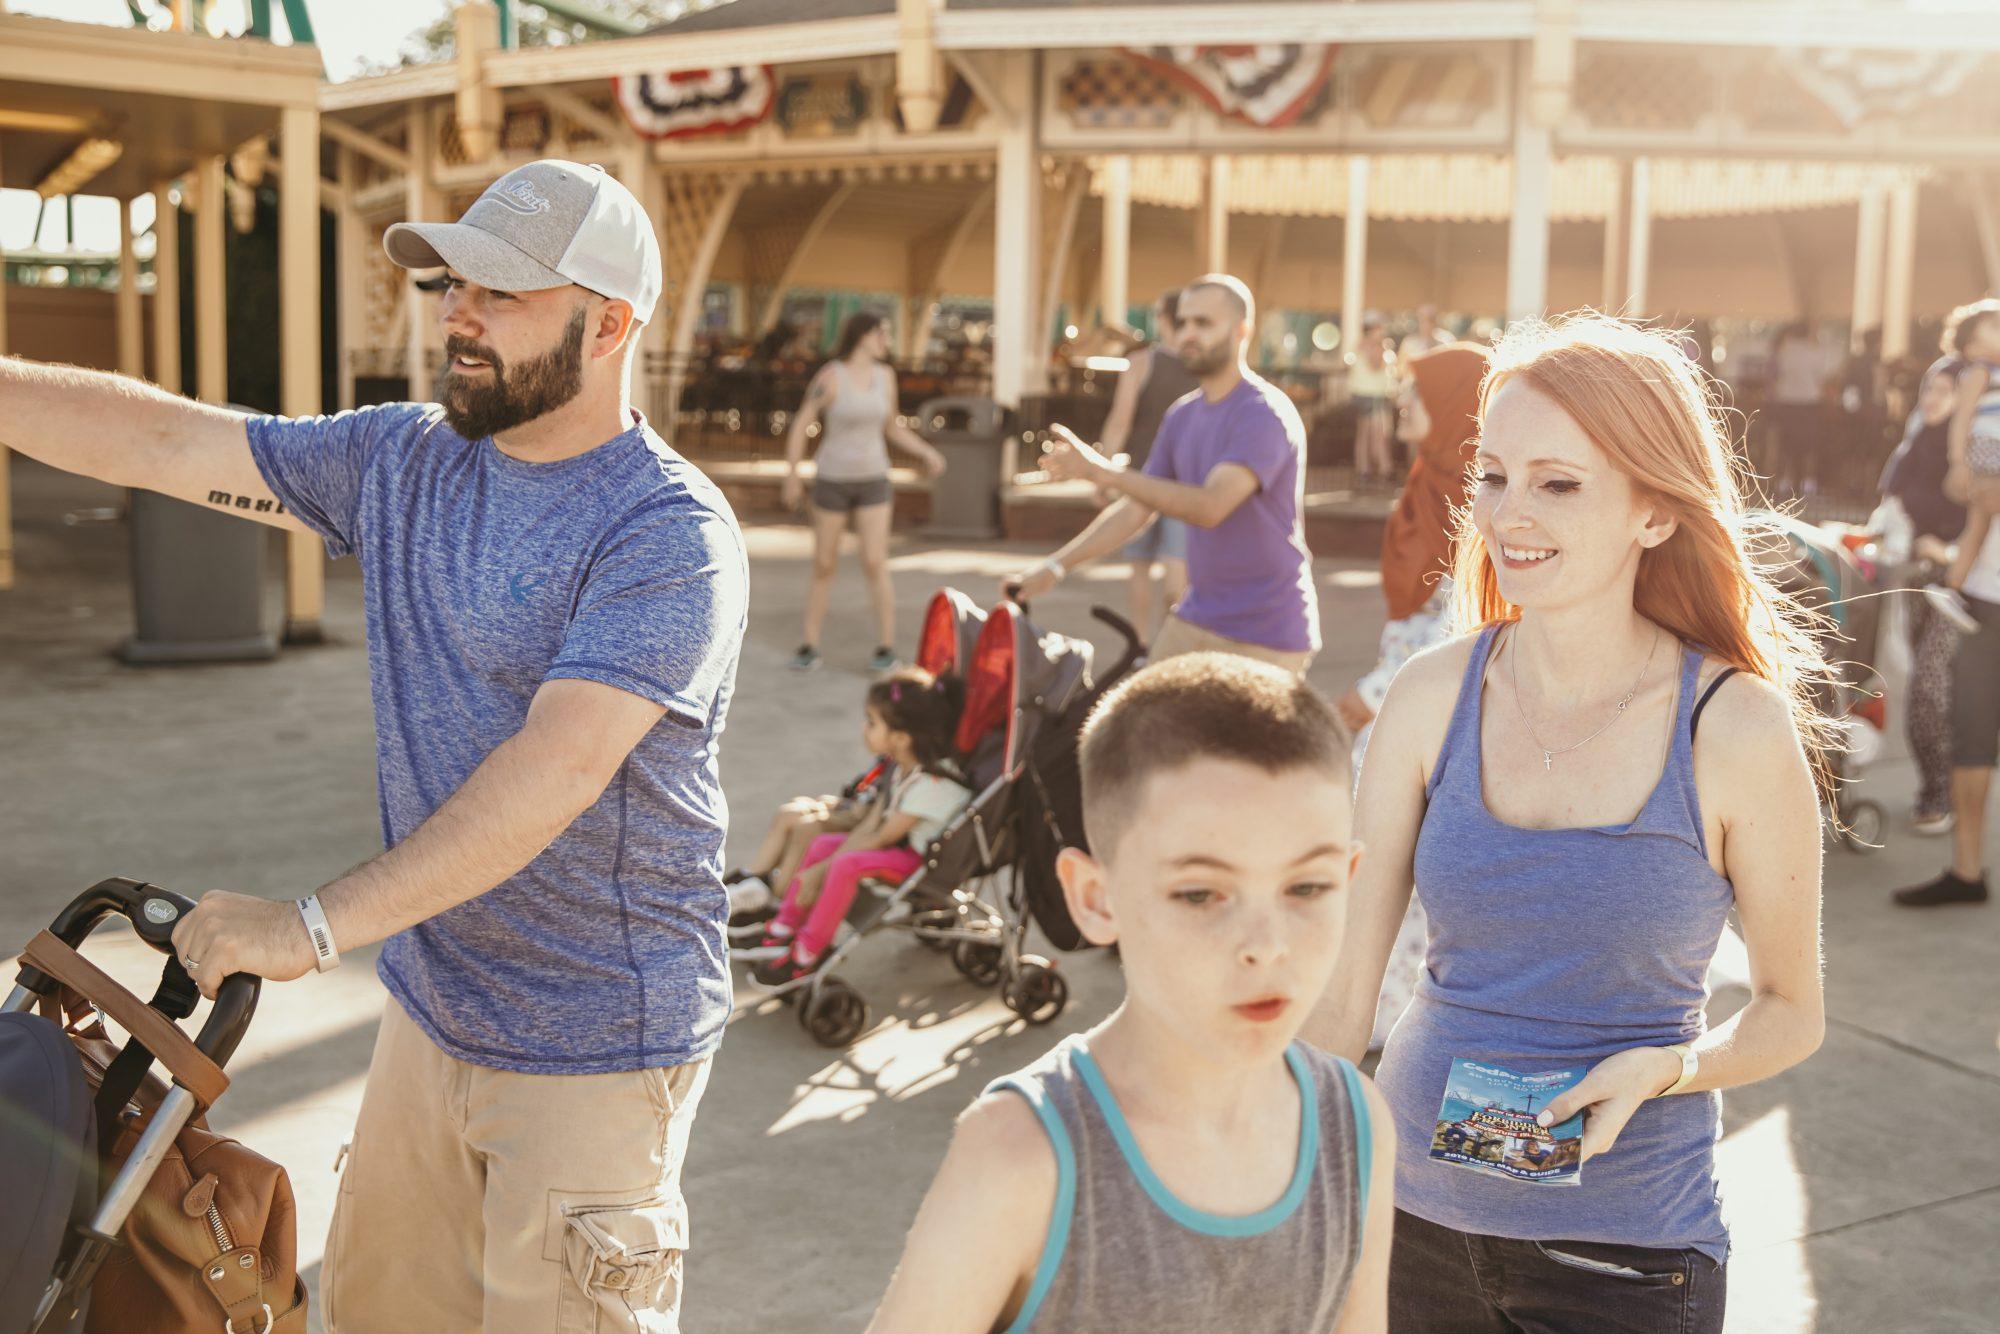 walking through cedar point as a family